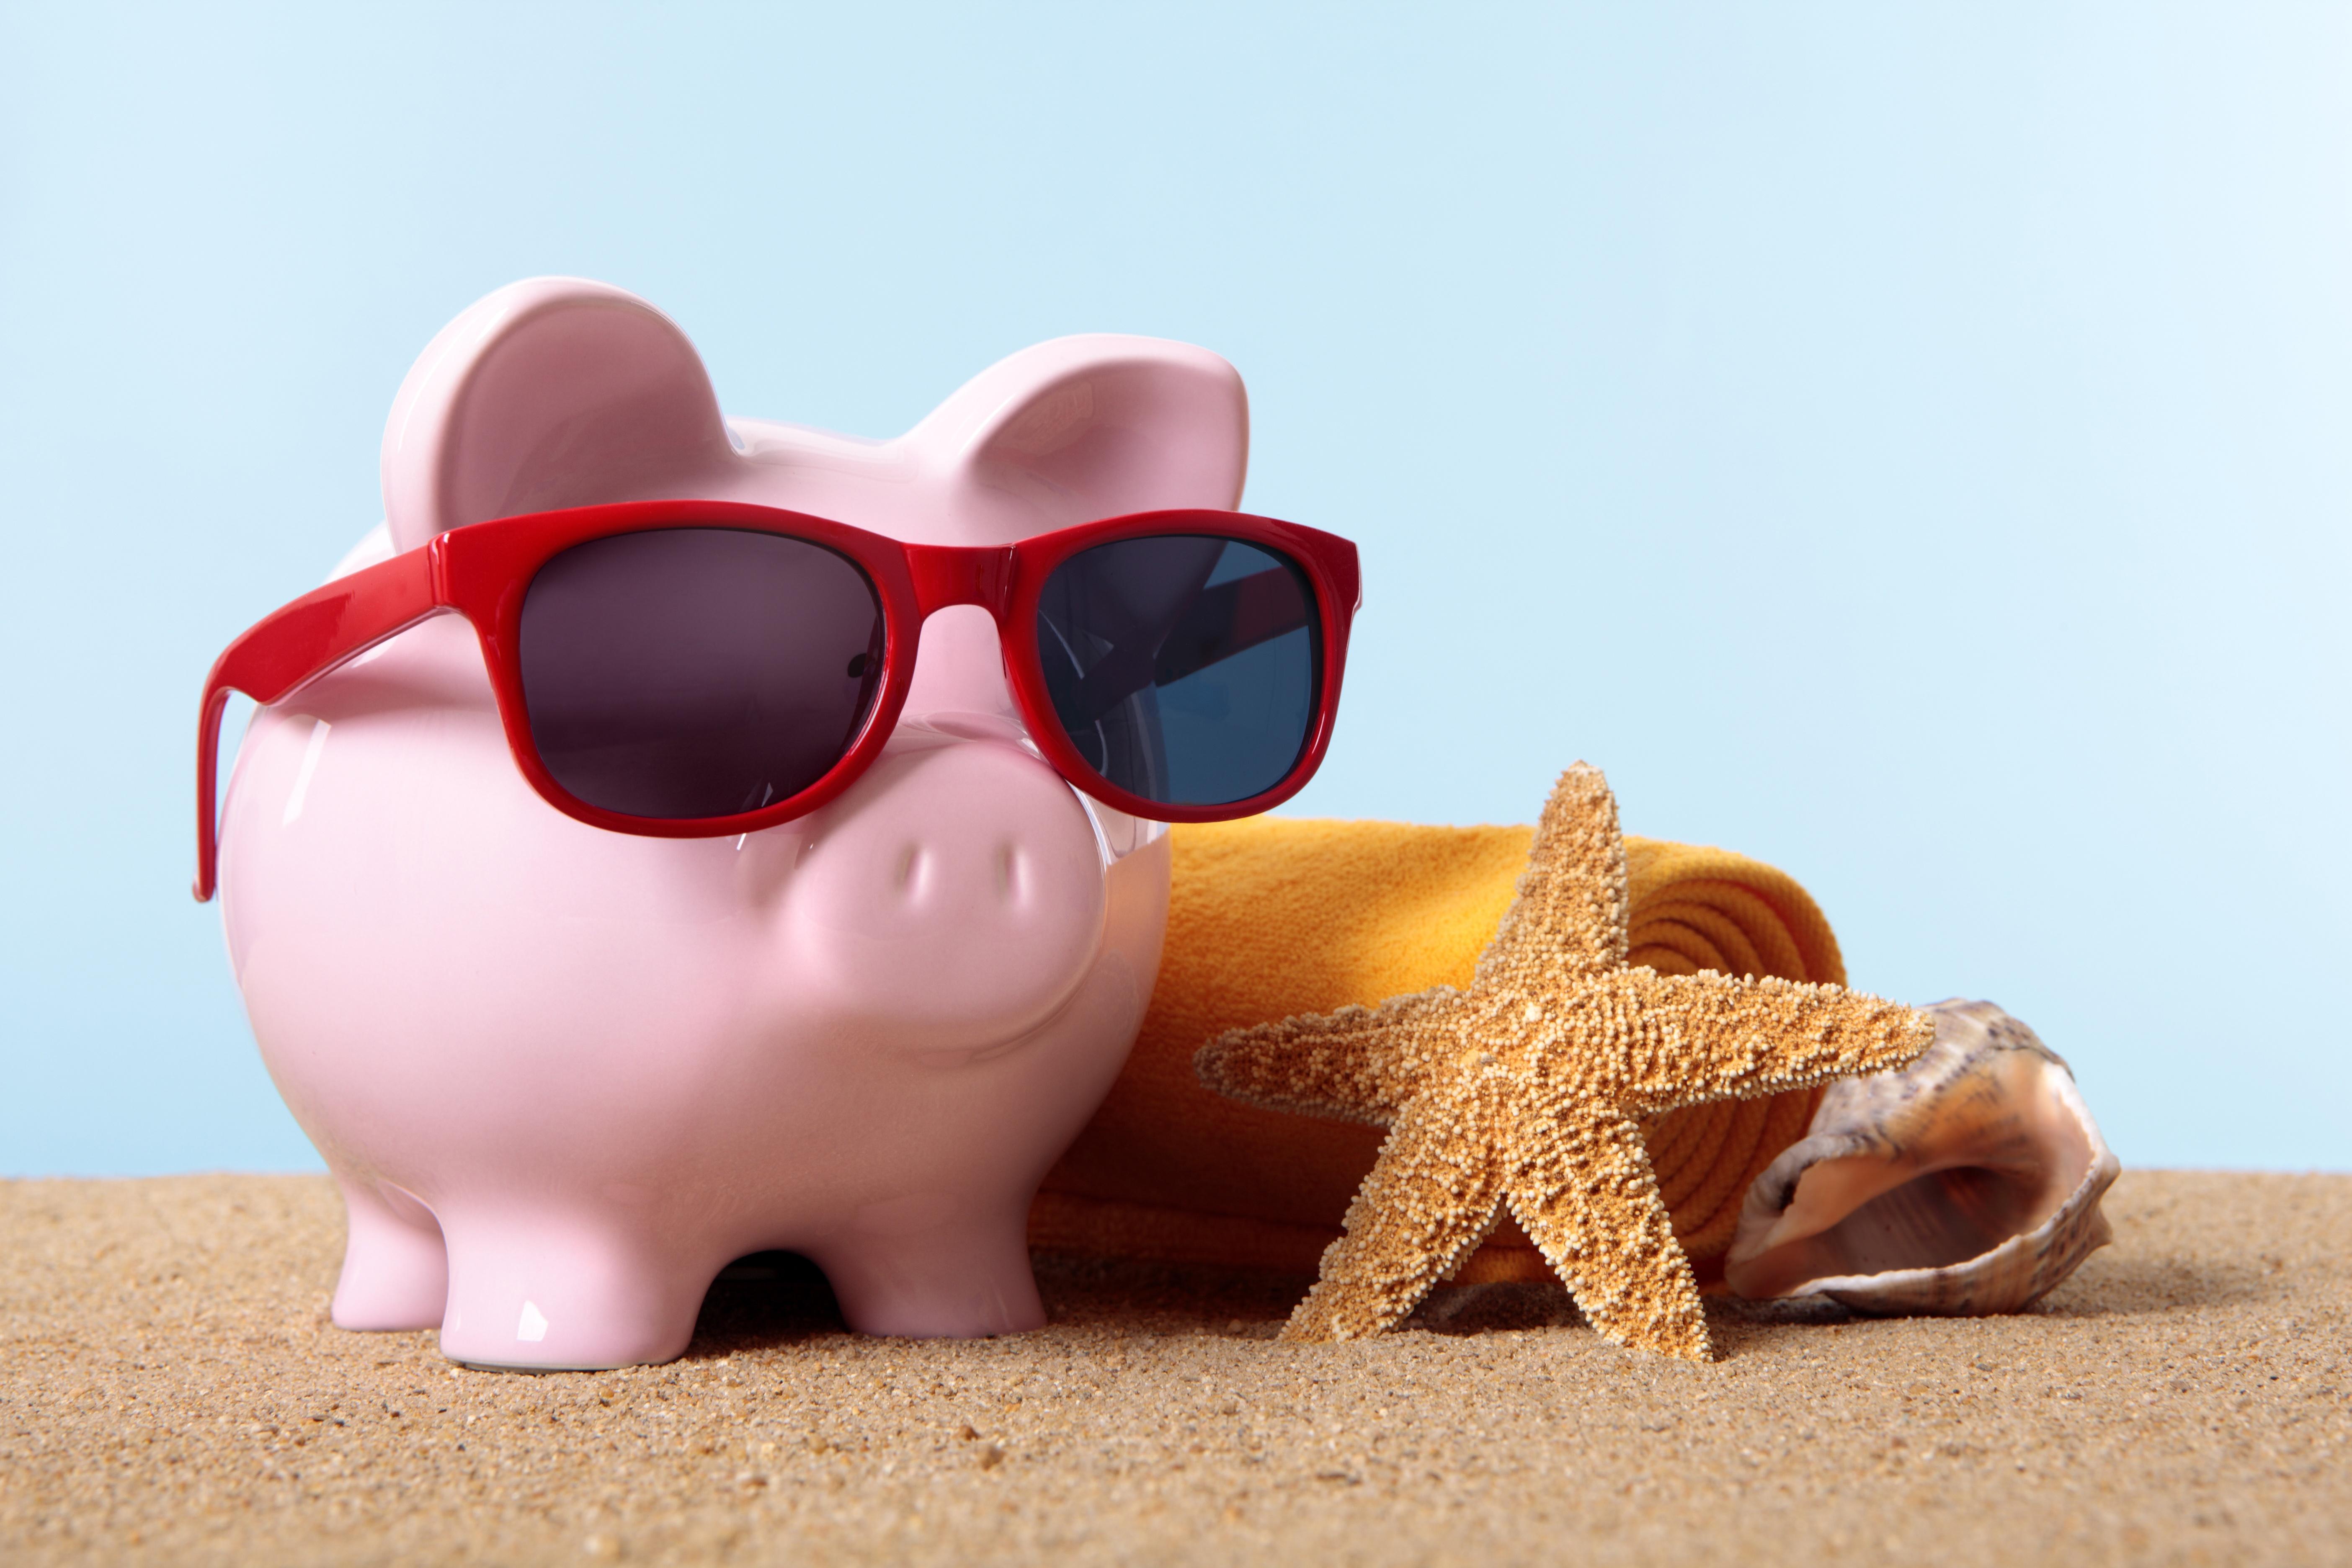 Expedia CruiseShipCenters Estimates $1.5 Million in Savings over 3 Years